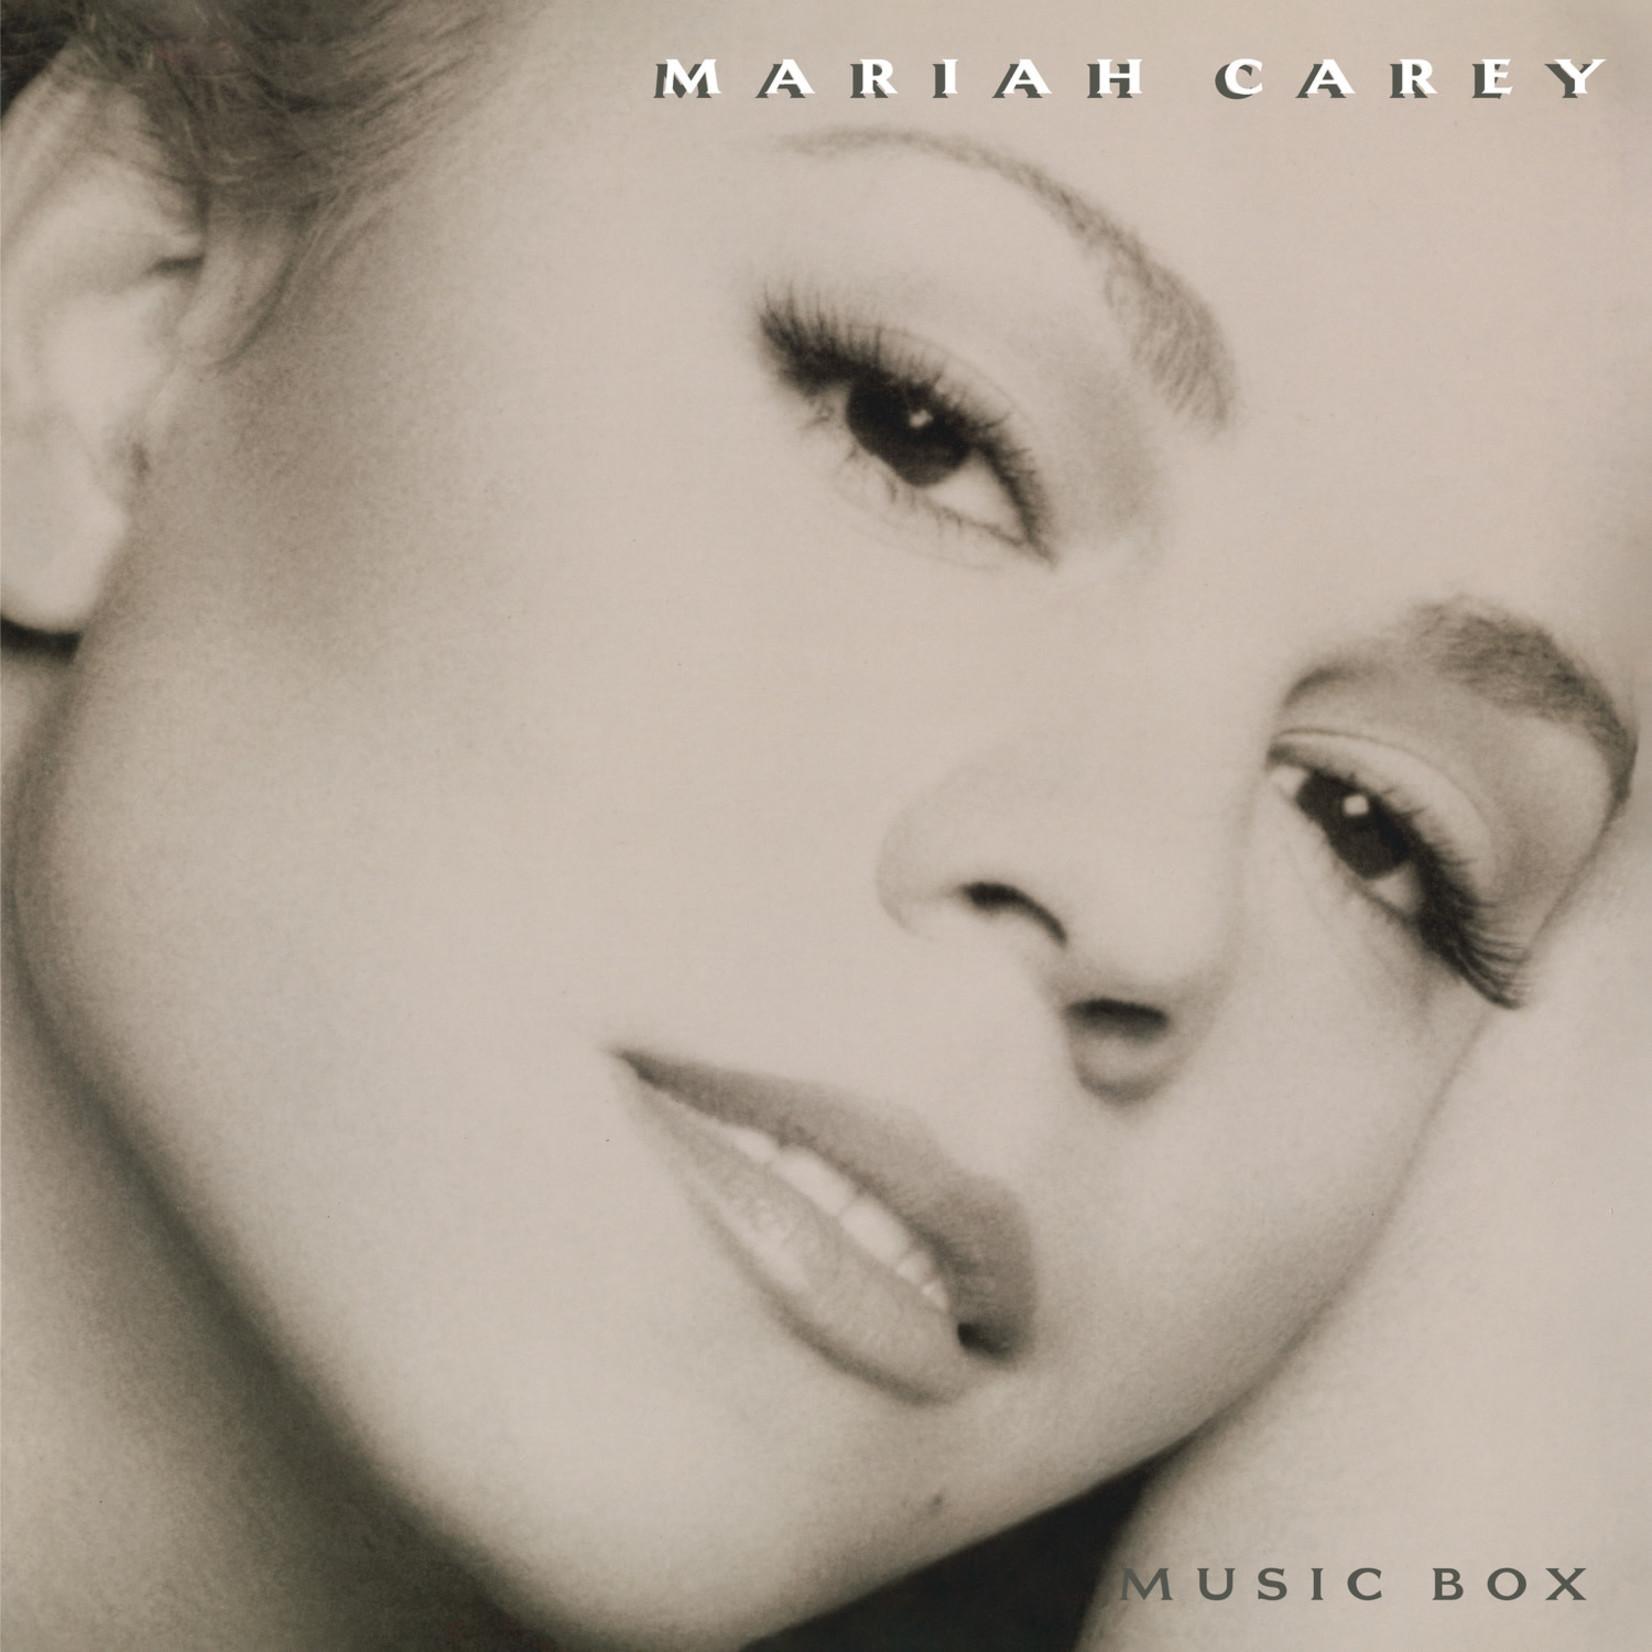 [New] Carey, Mariah: Music Box